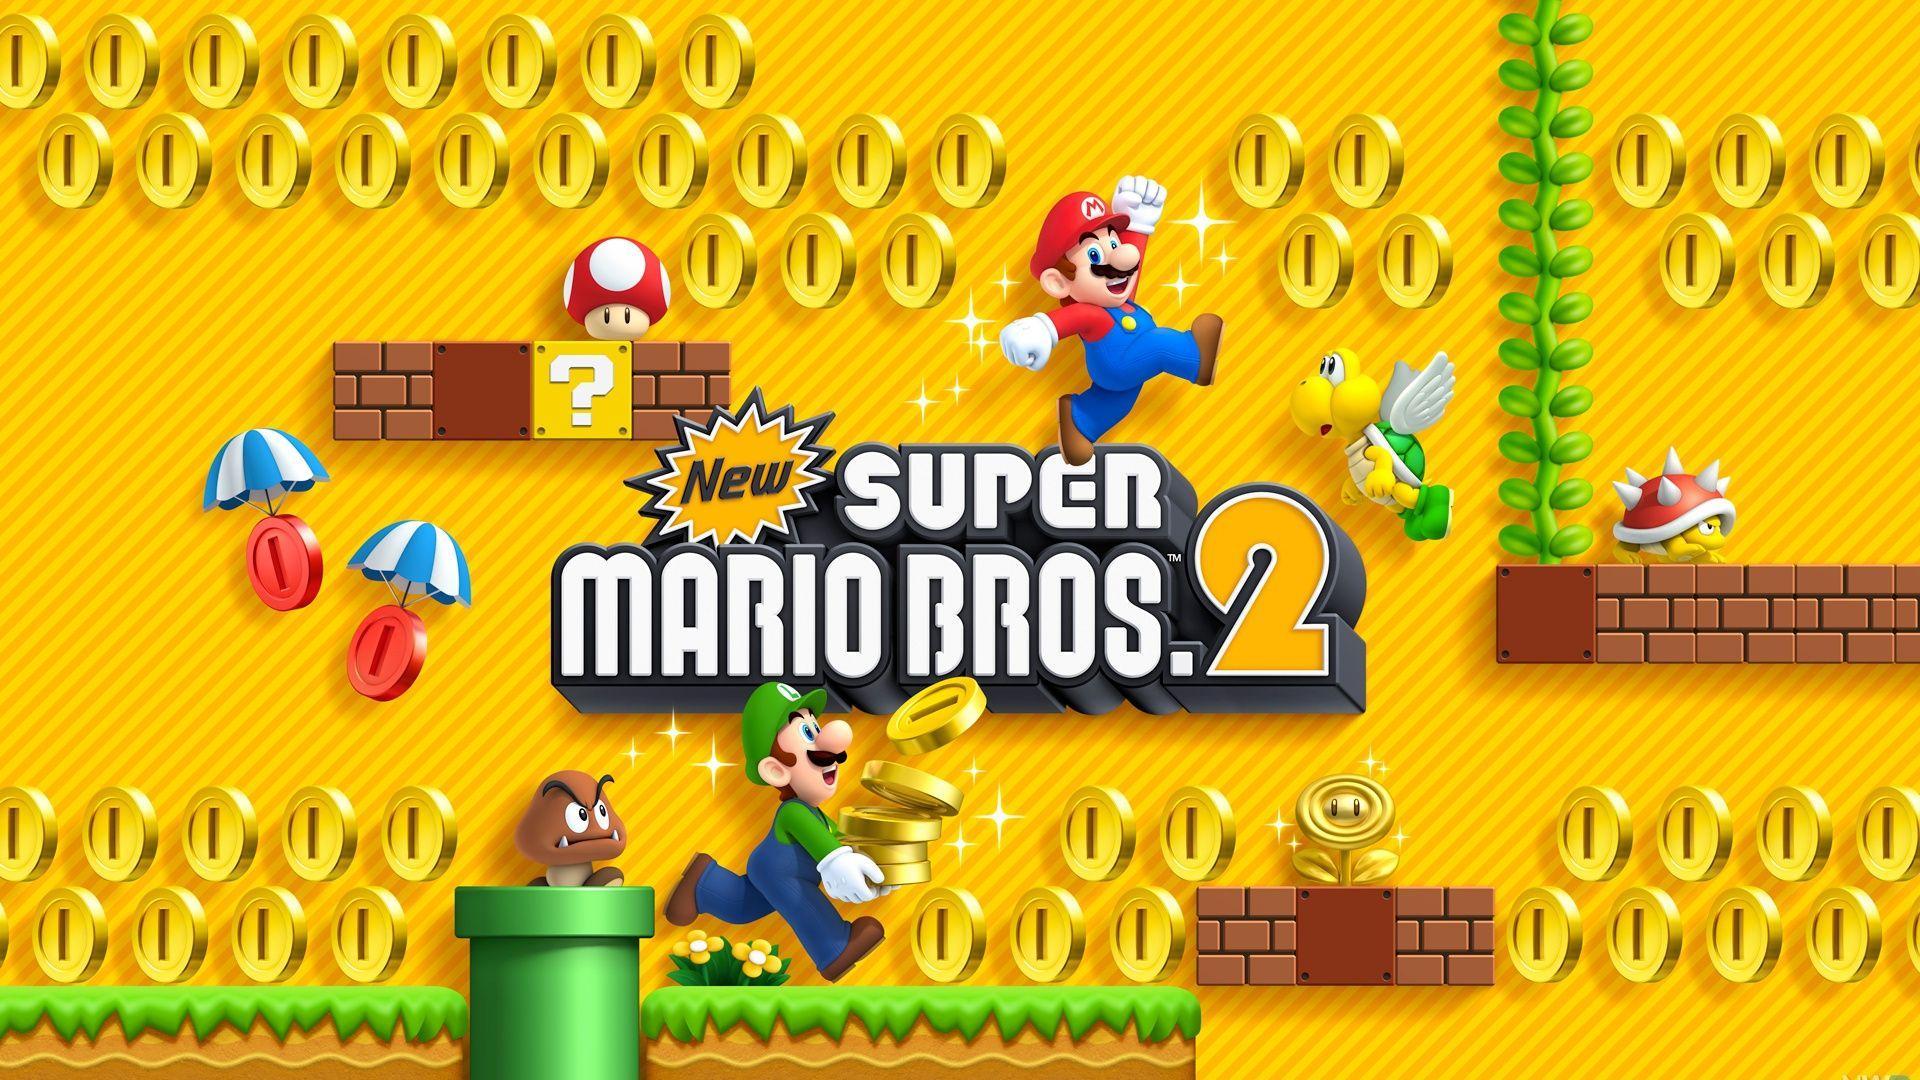 New Super Mario Bros 2 Wallpapers - Top